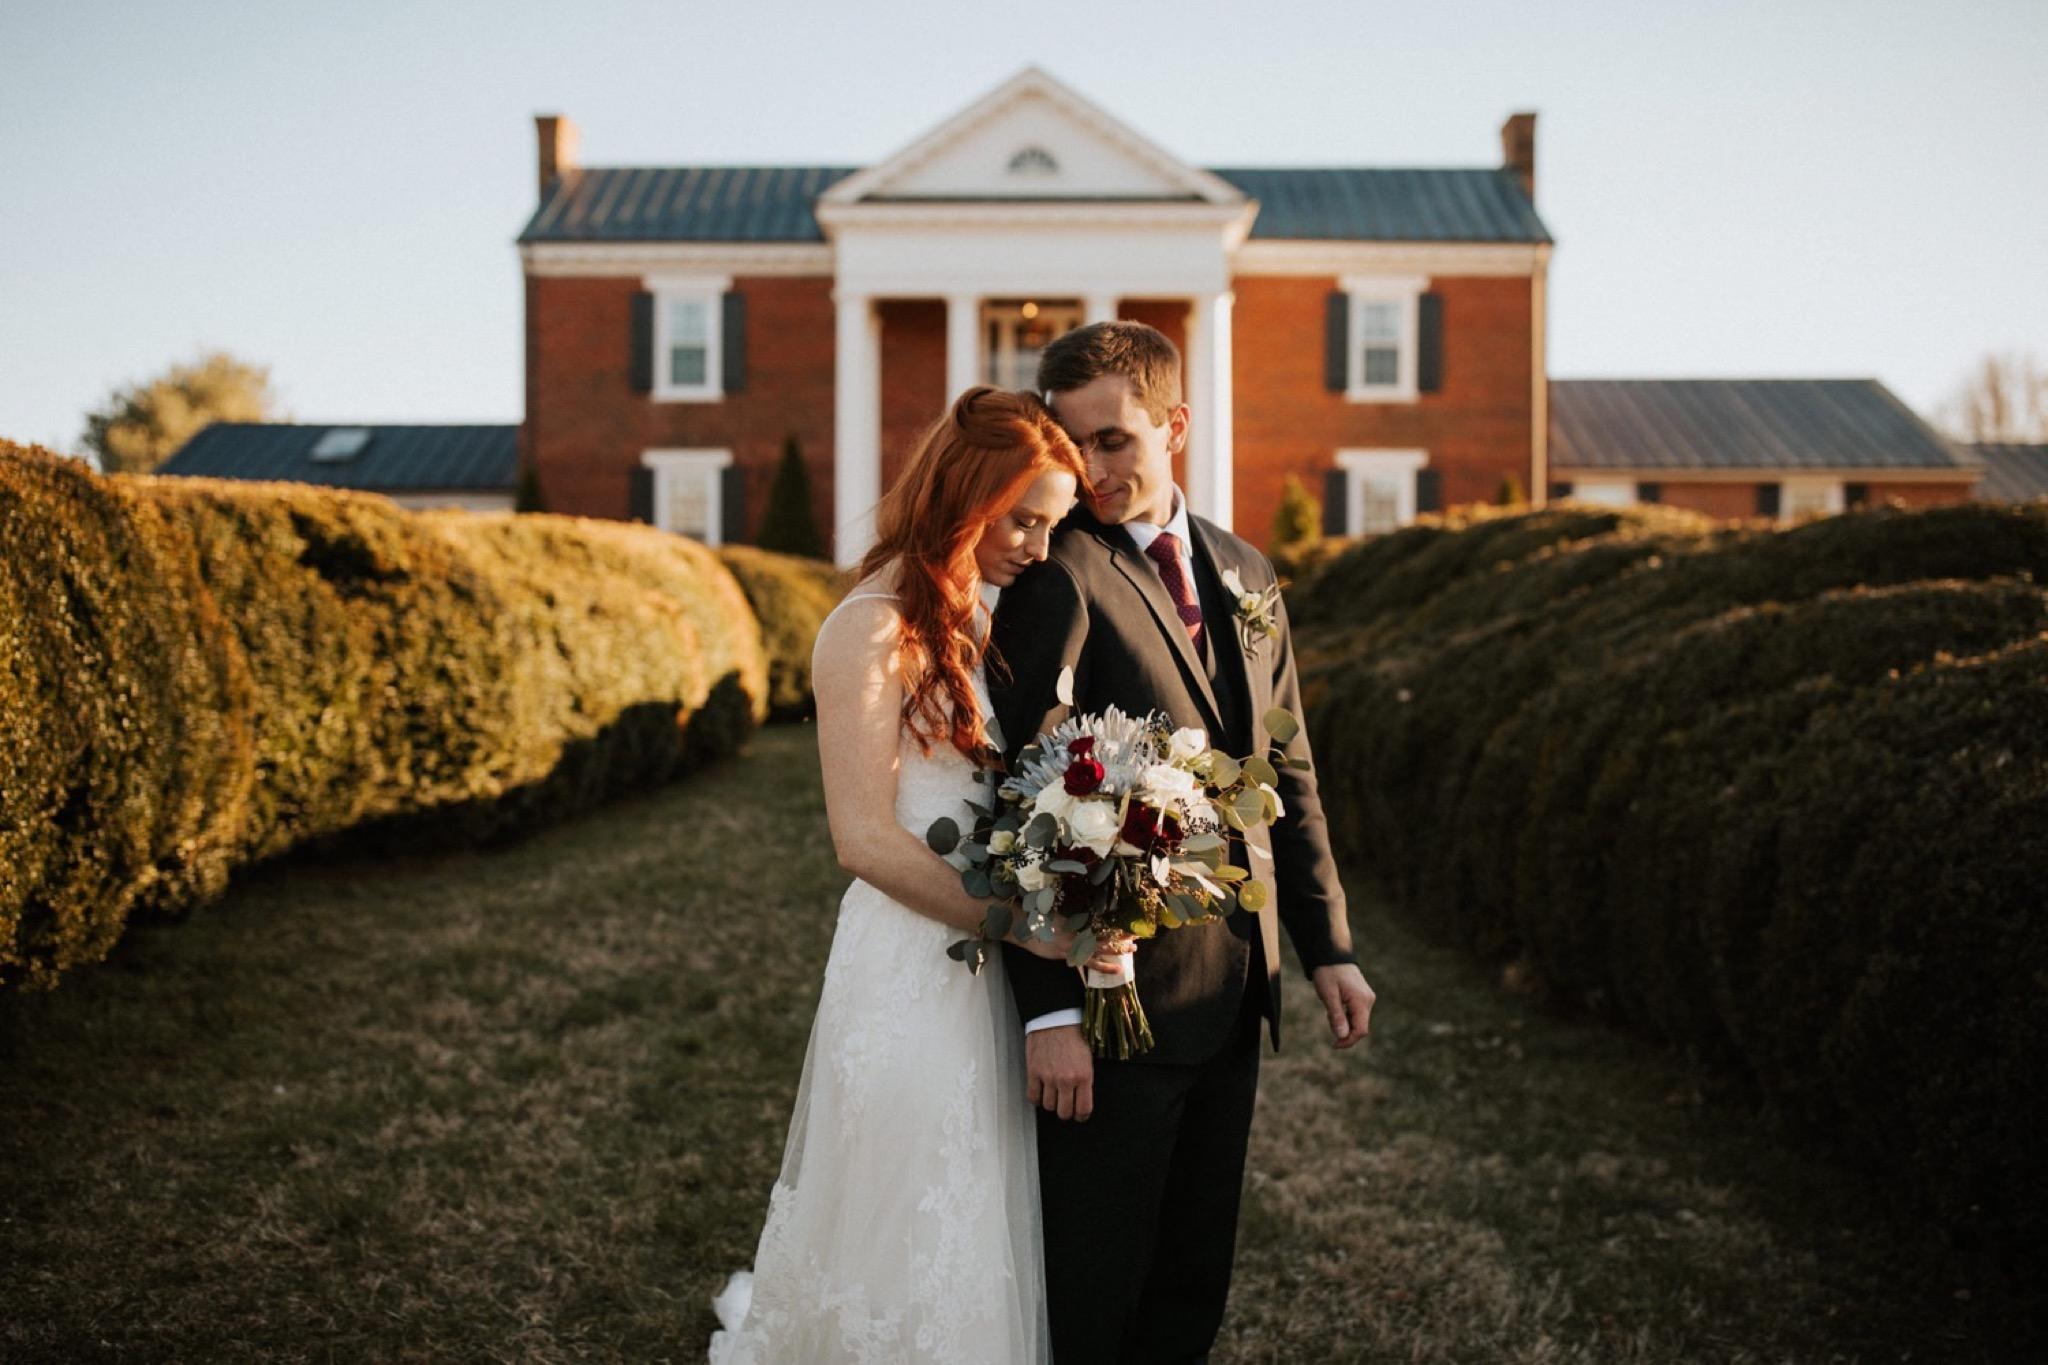 66_West Manor Estate Weddings - Pat Cori Photography-138_romantic_brideandgroom_WestManorEstate_Portraits_VirginiaWeddingPhotographer.jpg